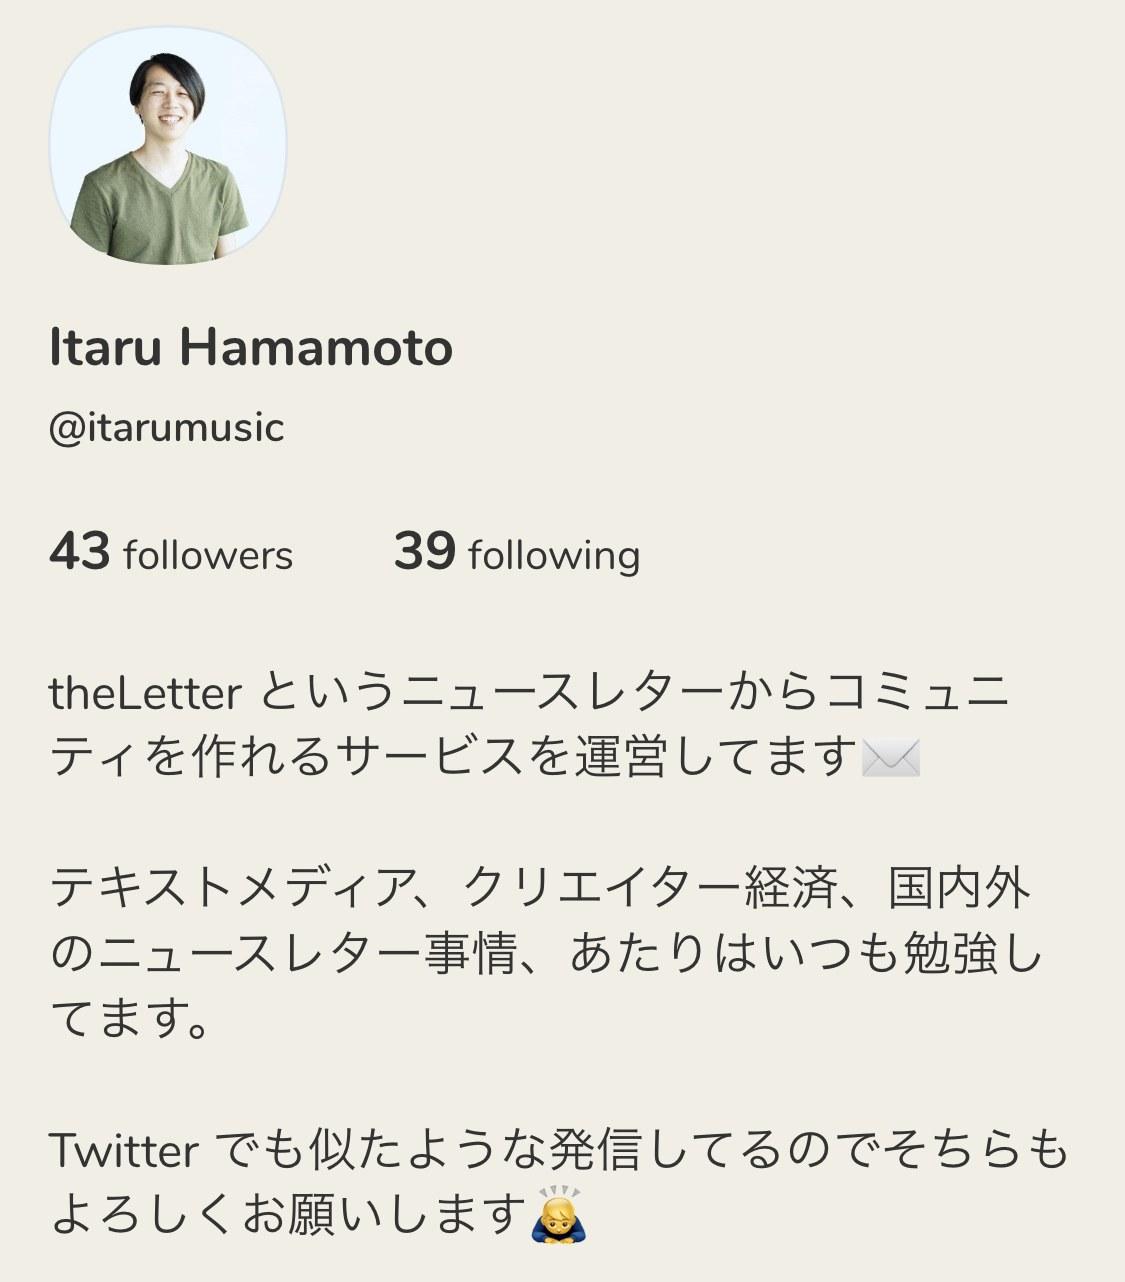 Clubhouse - Itaru Hamamoto